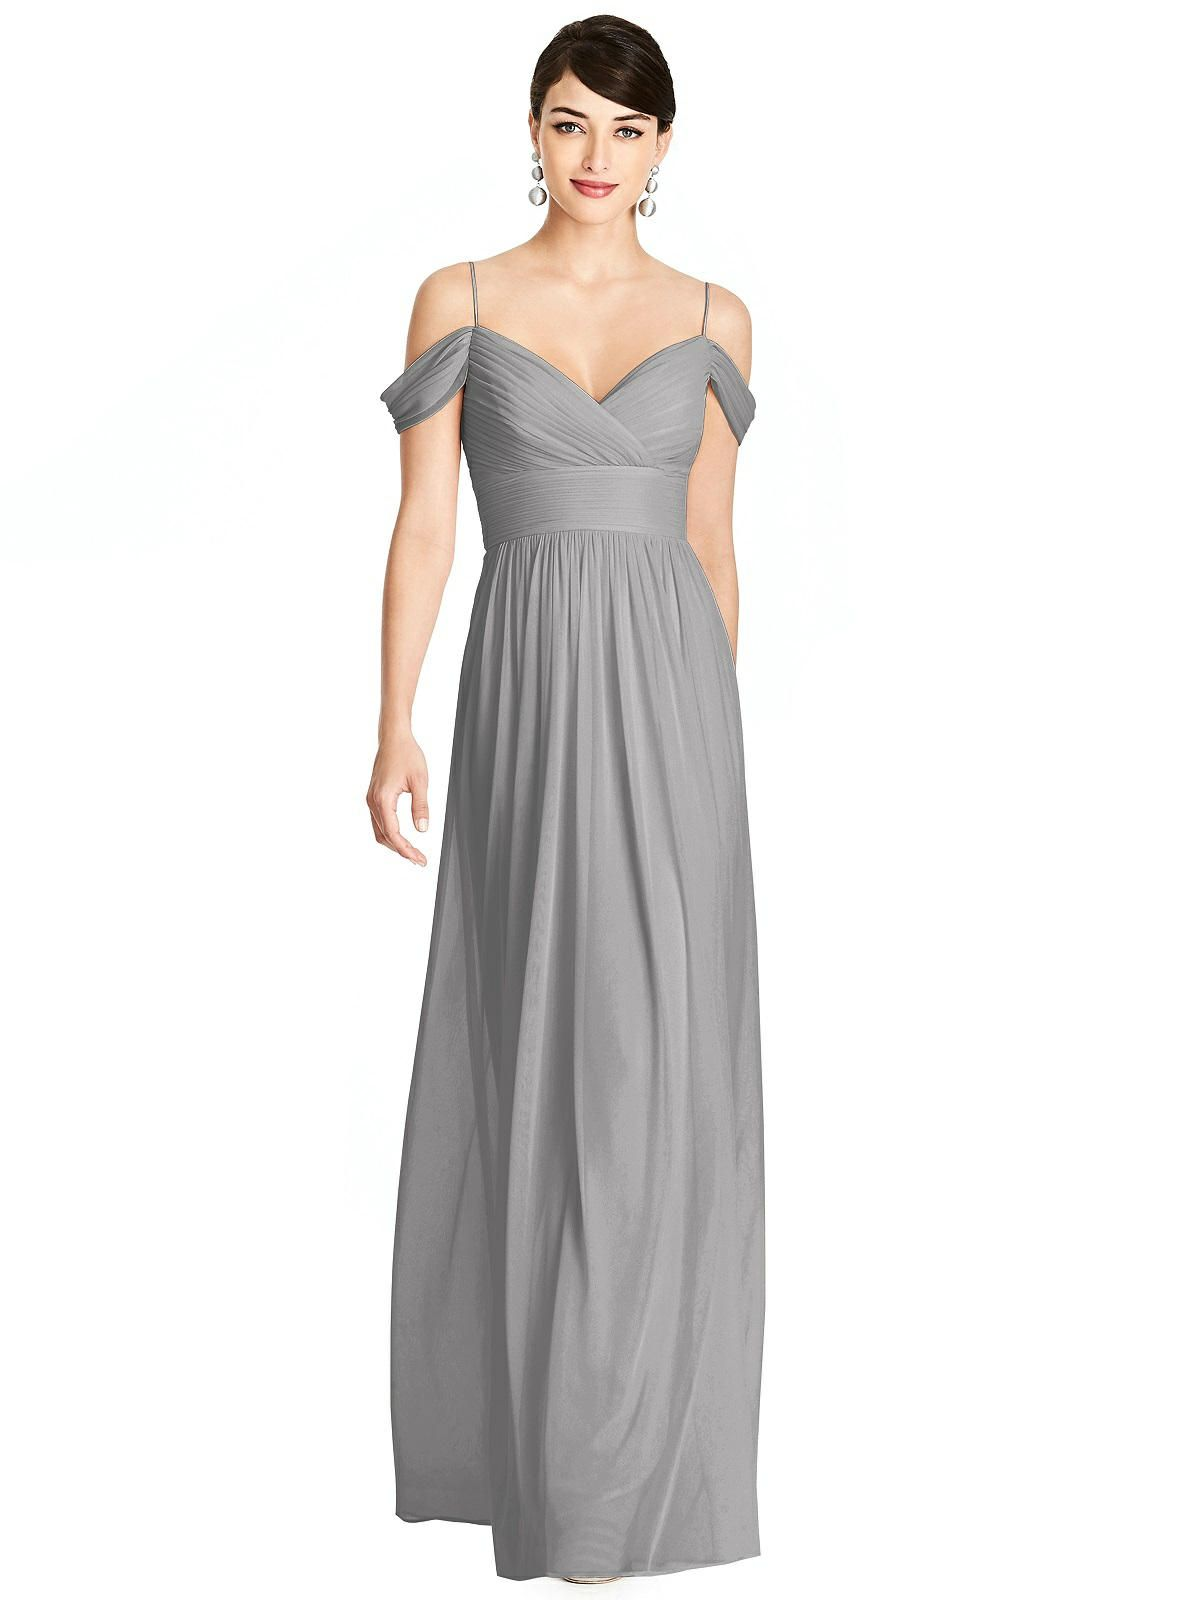 adc22d6f480 Cheap Dessy Bridesmaid Dresses Uk - Gomes Weine AG